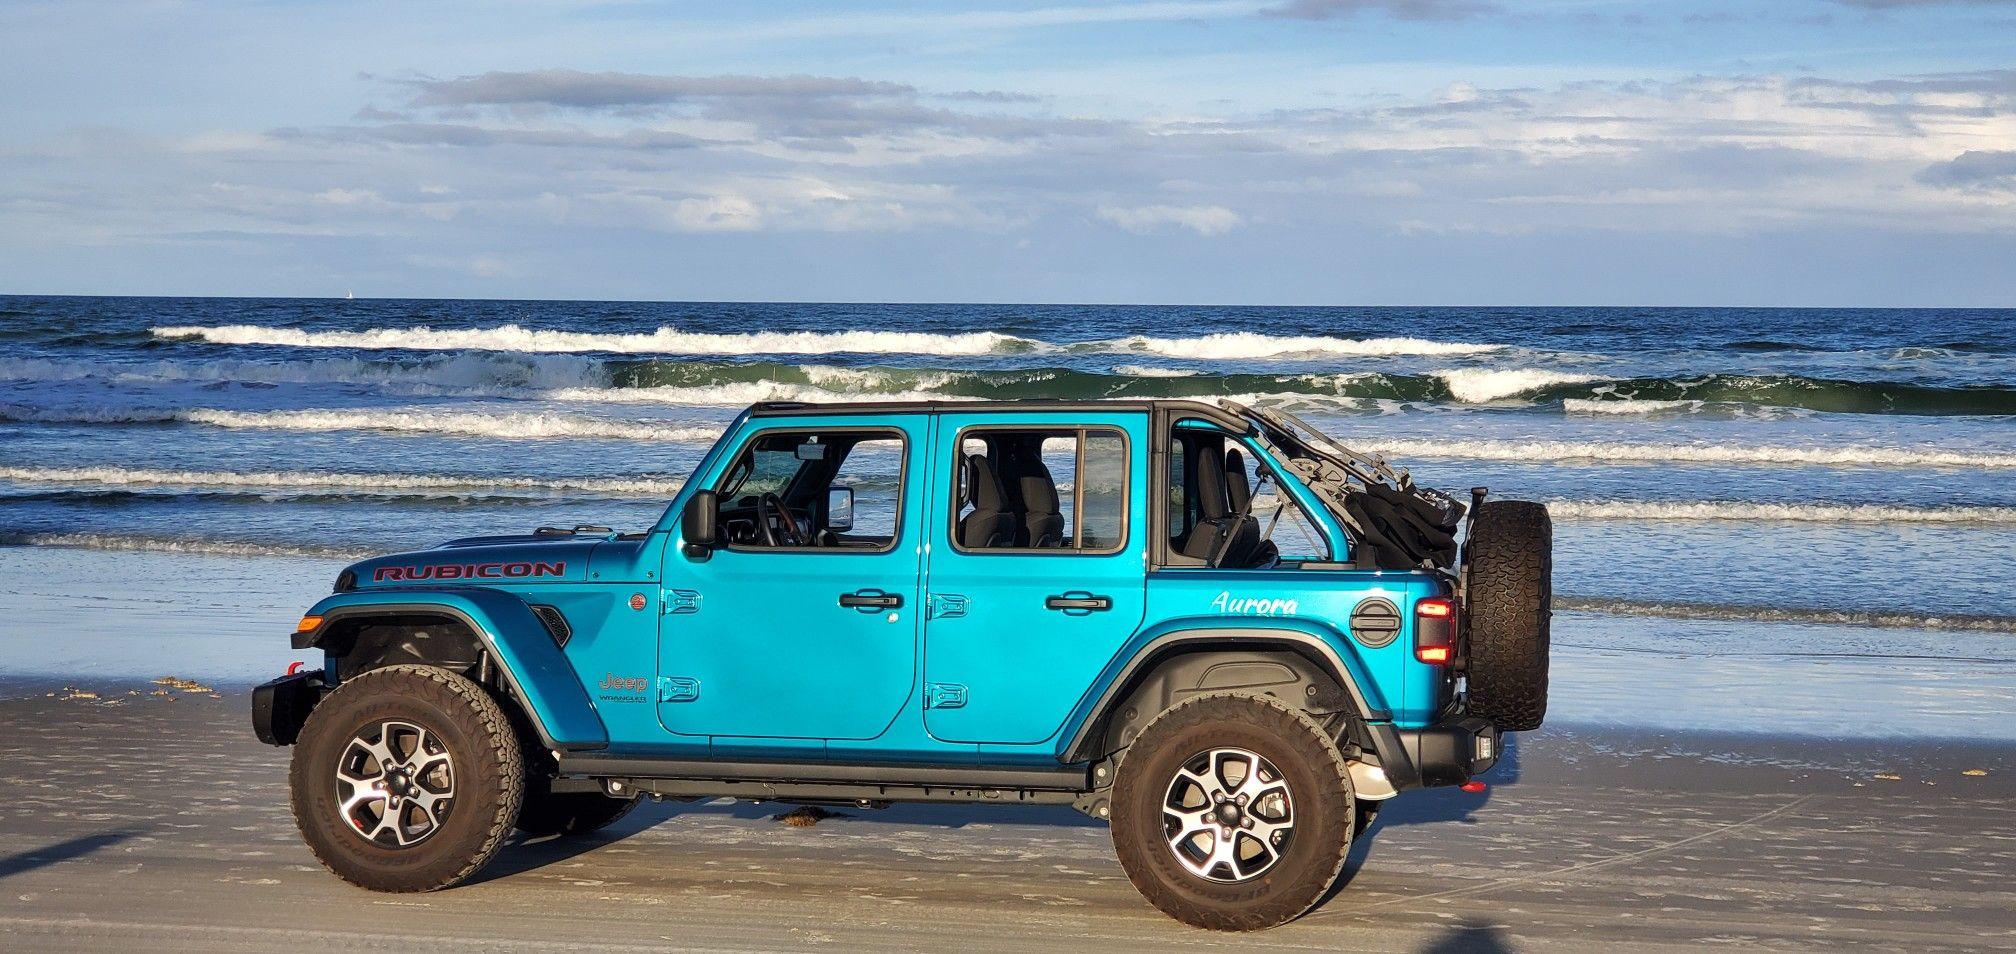 Our 2019 jeep wrangler JLU Rubicon on daytona beach. in